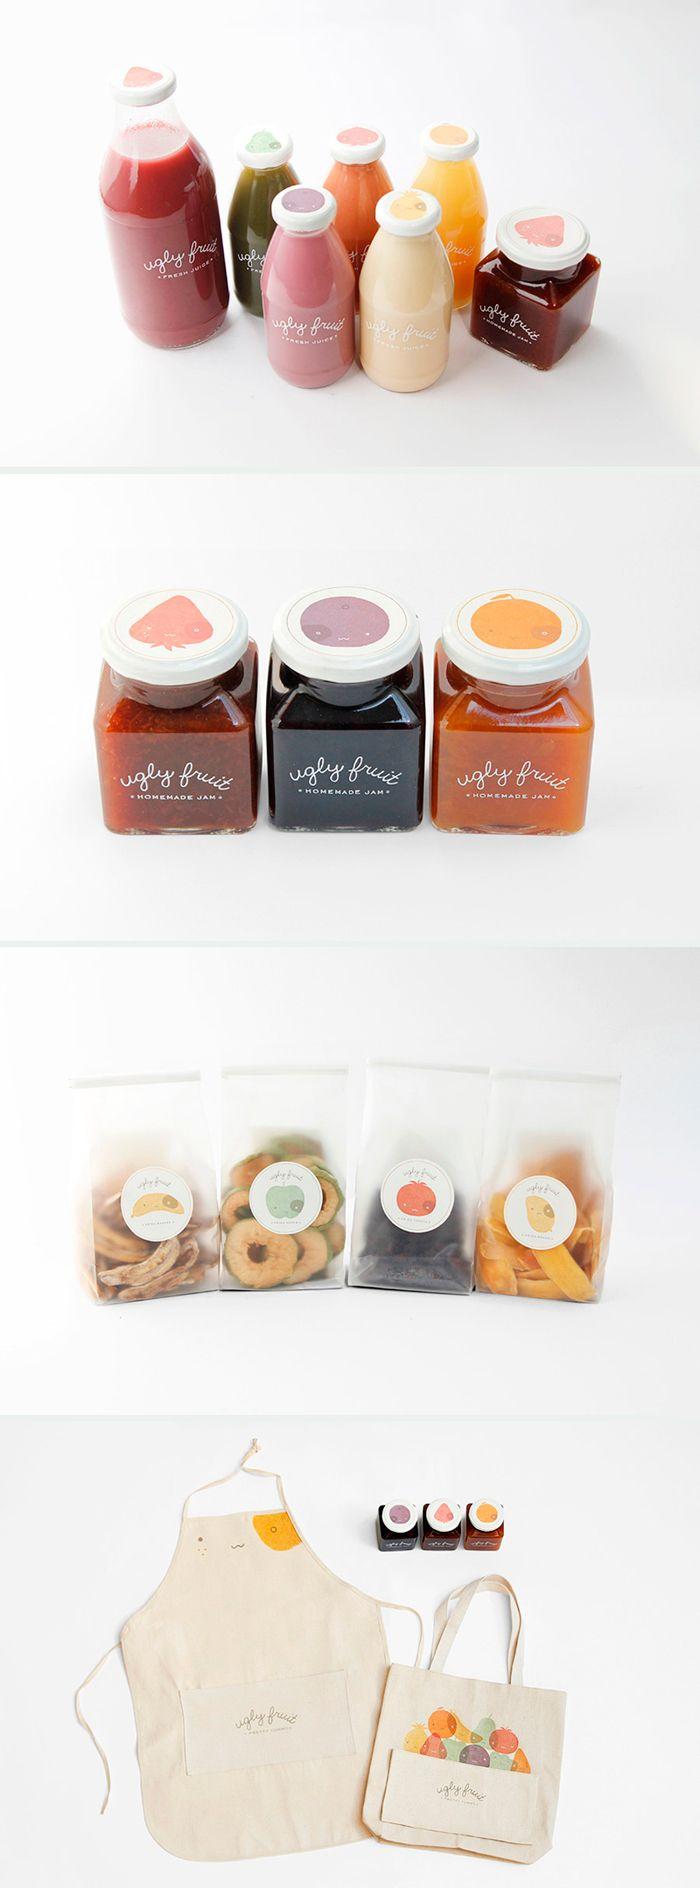 packaging / ugly fruit